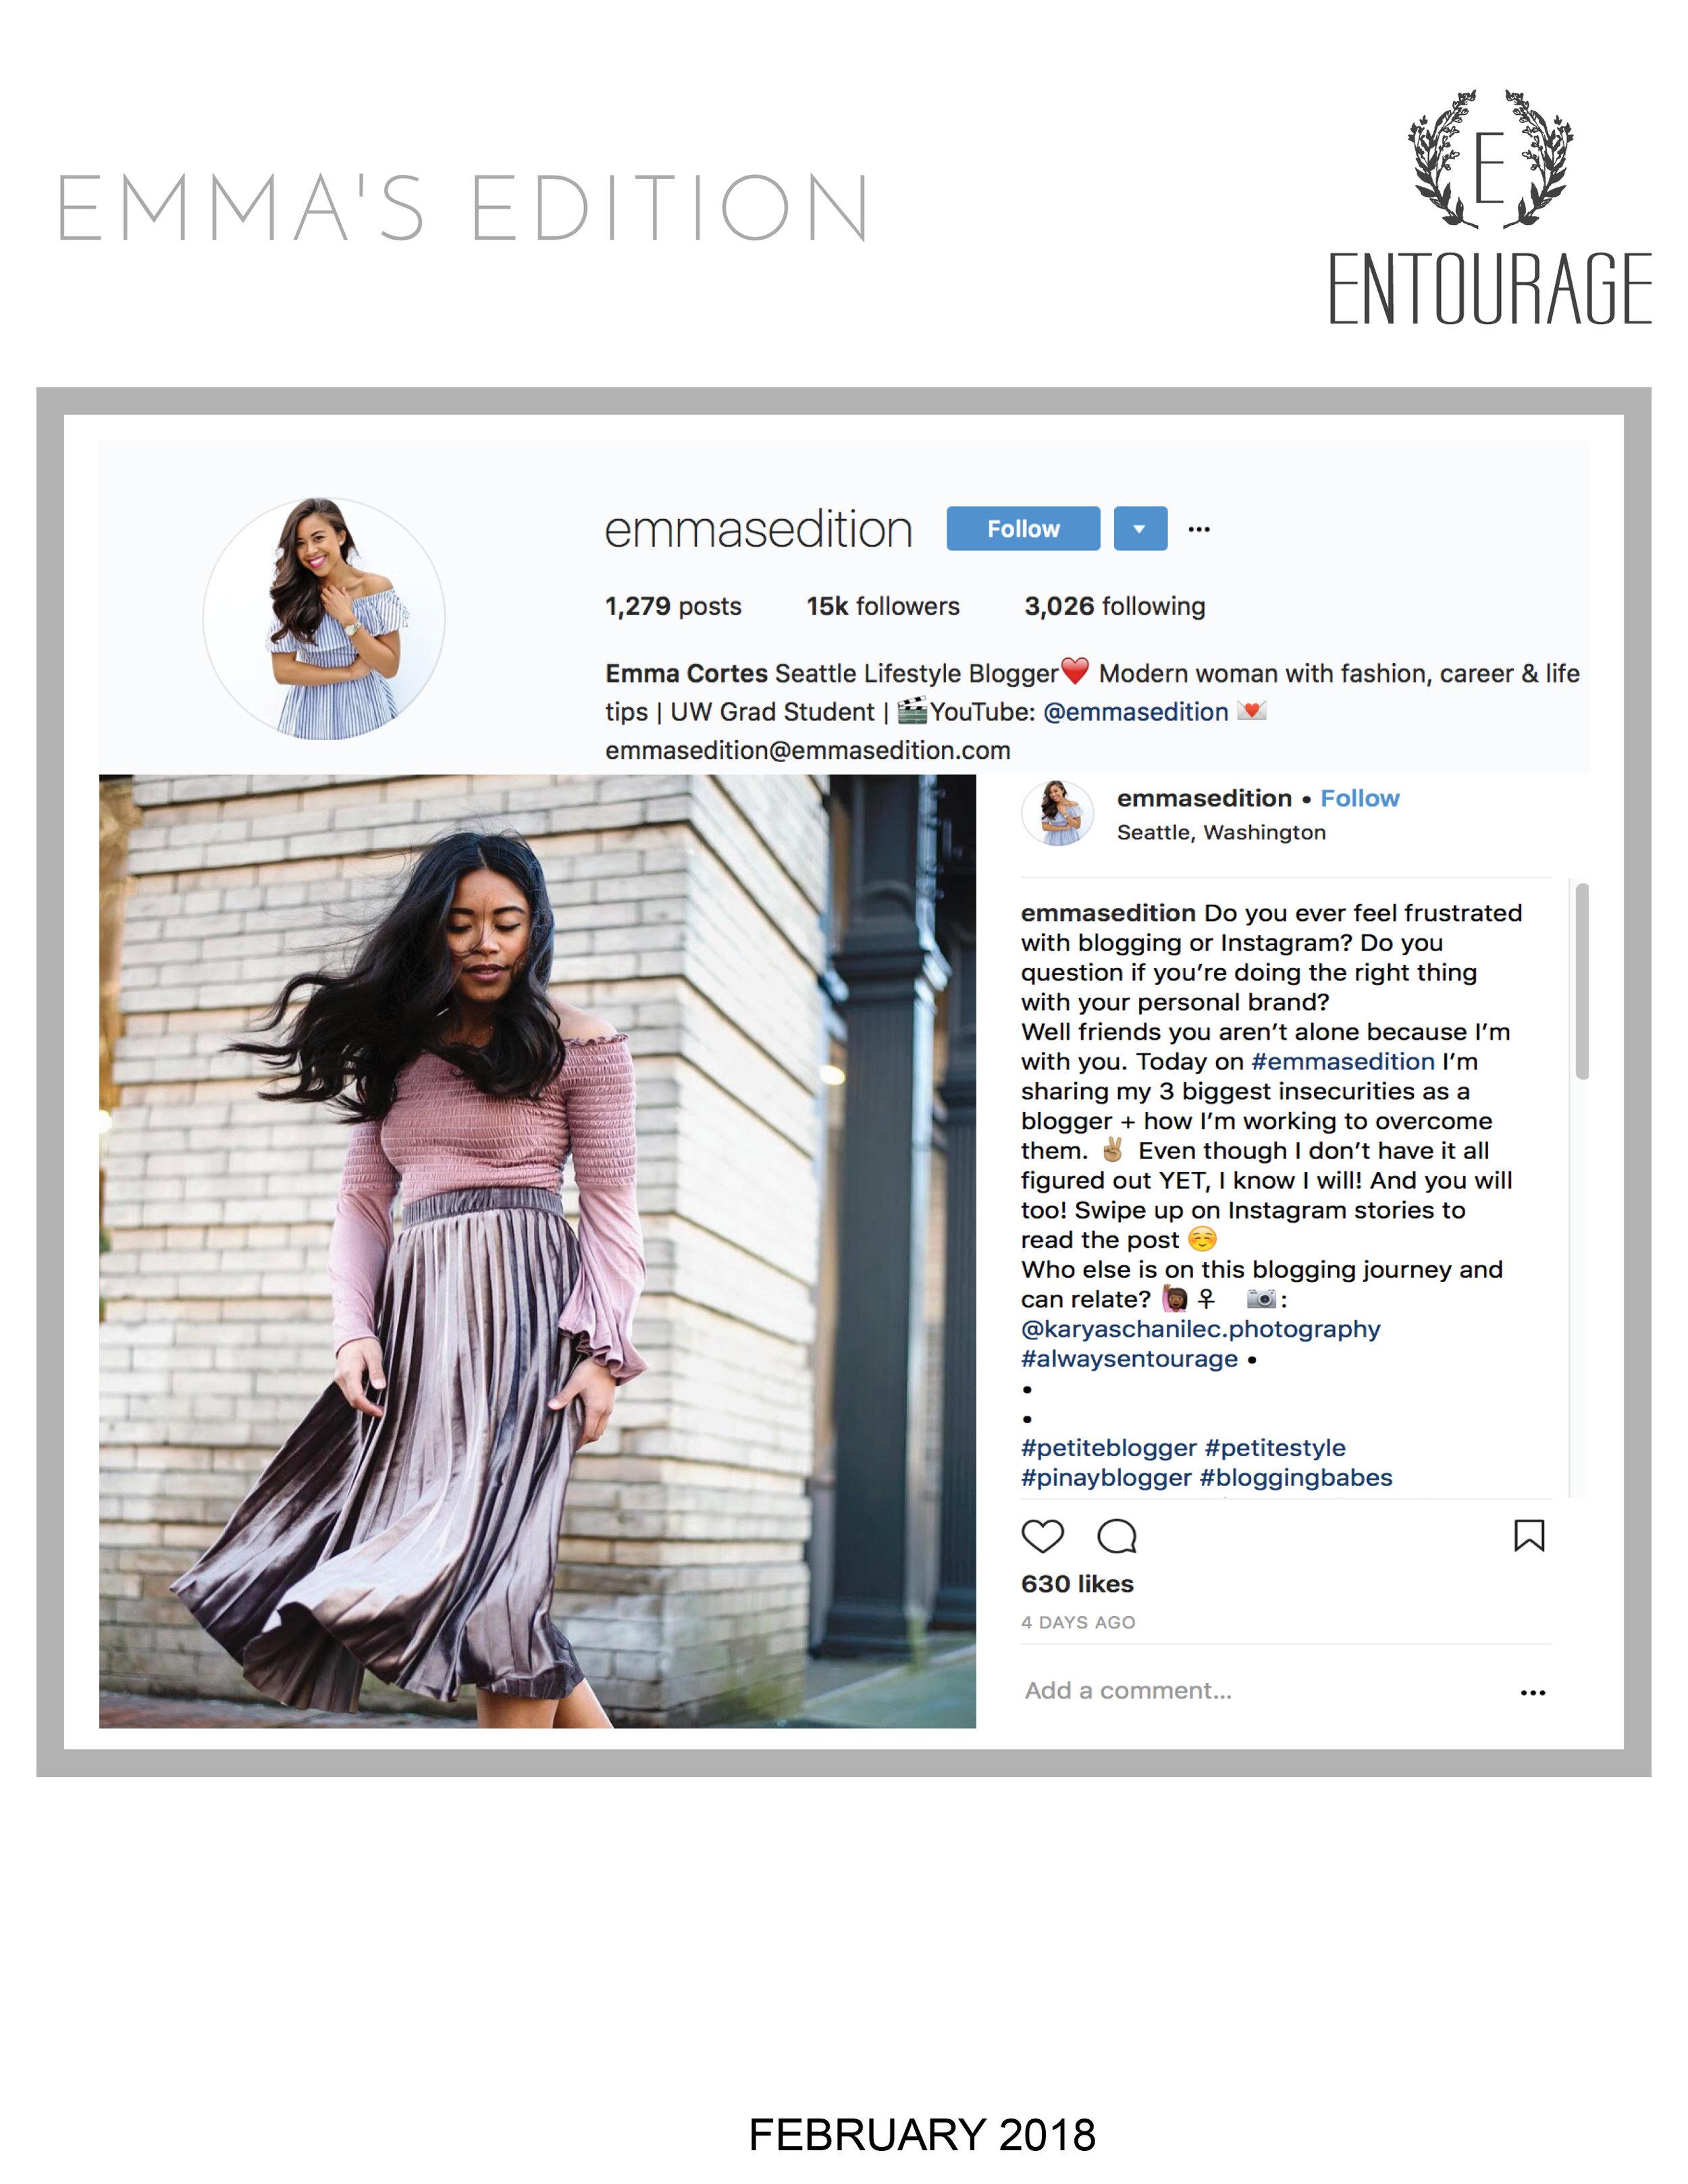 Entourage_EmmaCortes_February2018 copy.jpg